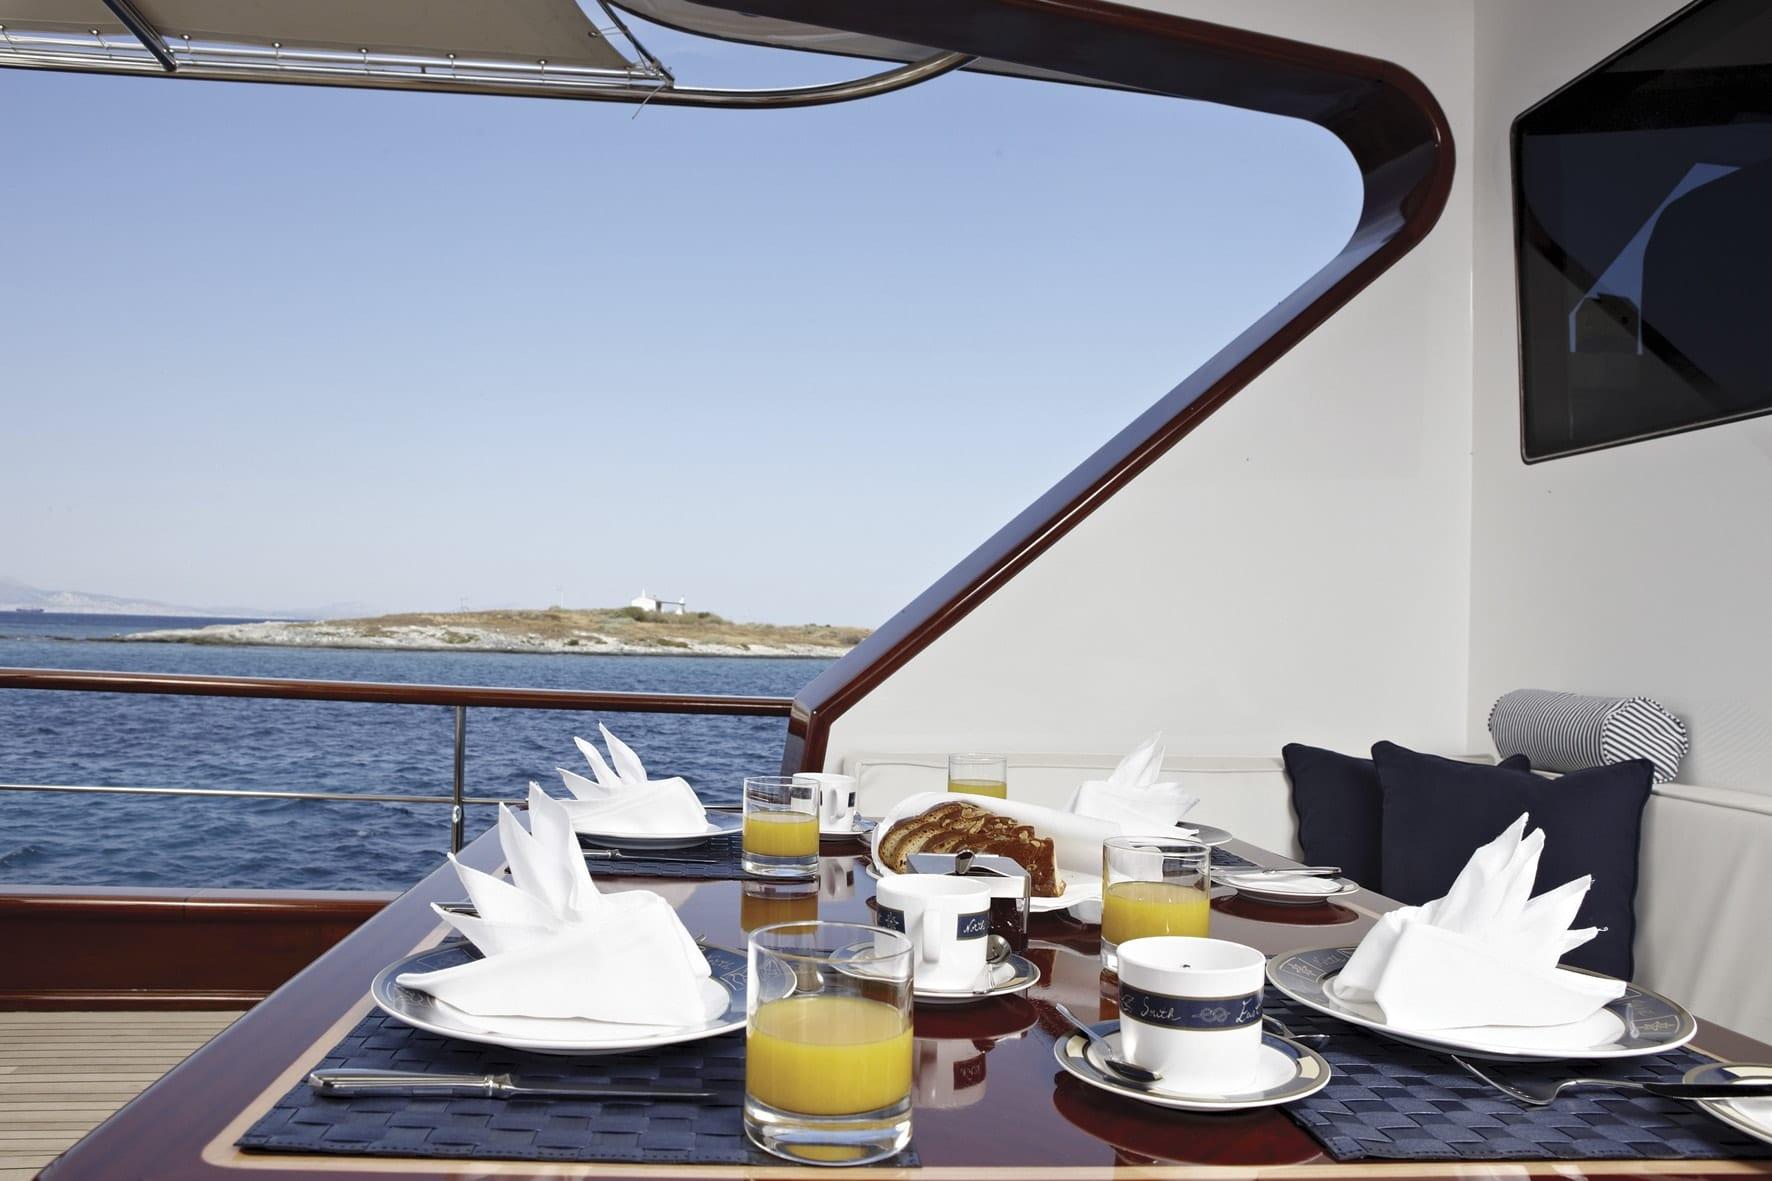 iraklis l motor sailer aft dining (1) min -  Valef Yachts Chartering - 1785